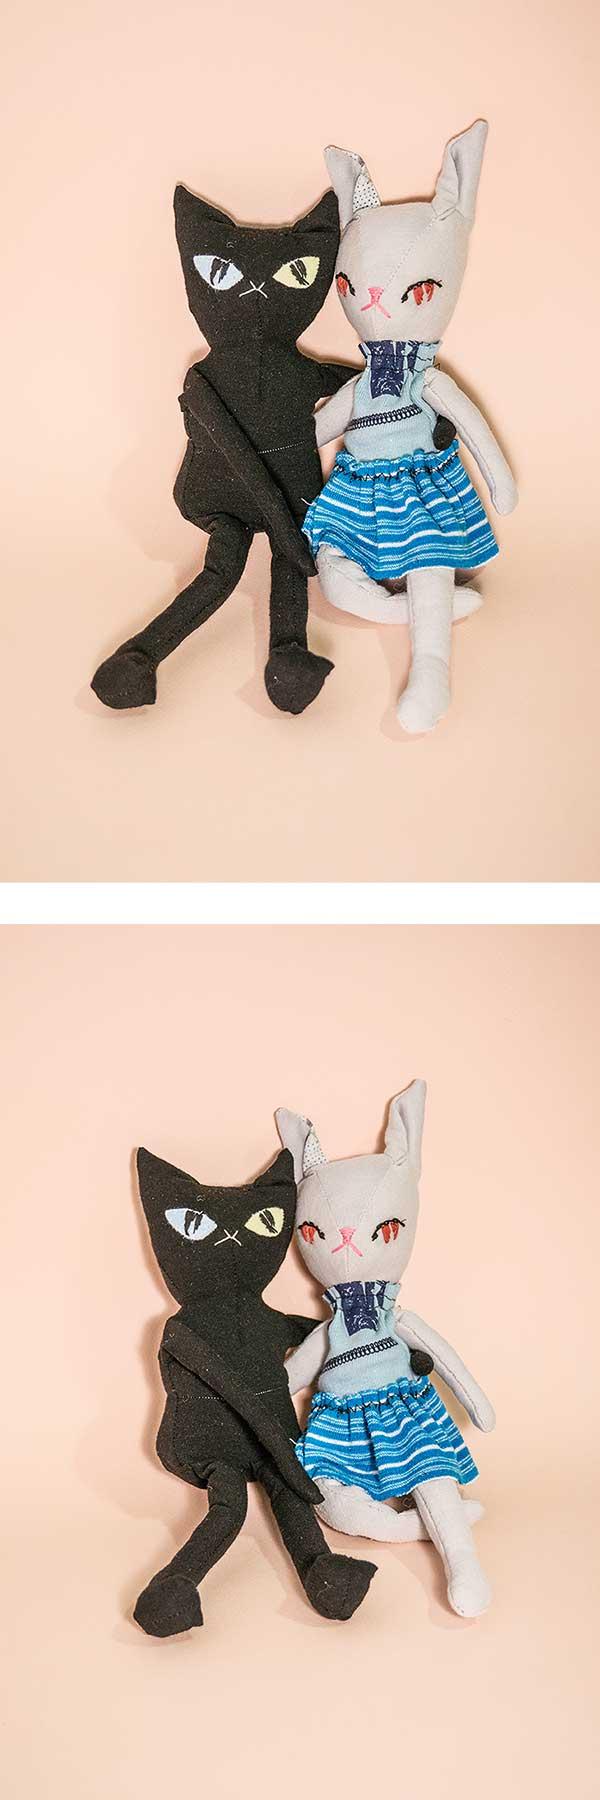 becca the grey rabbit and ken the black cat   handmade cloth dolls